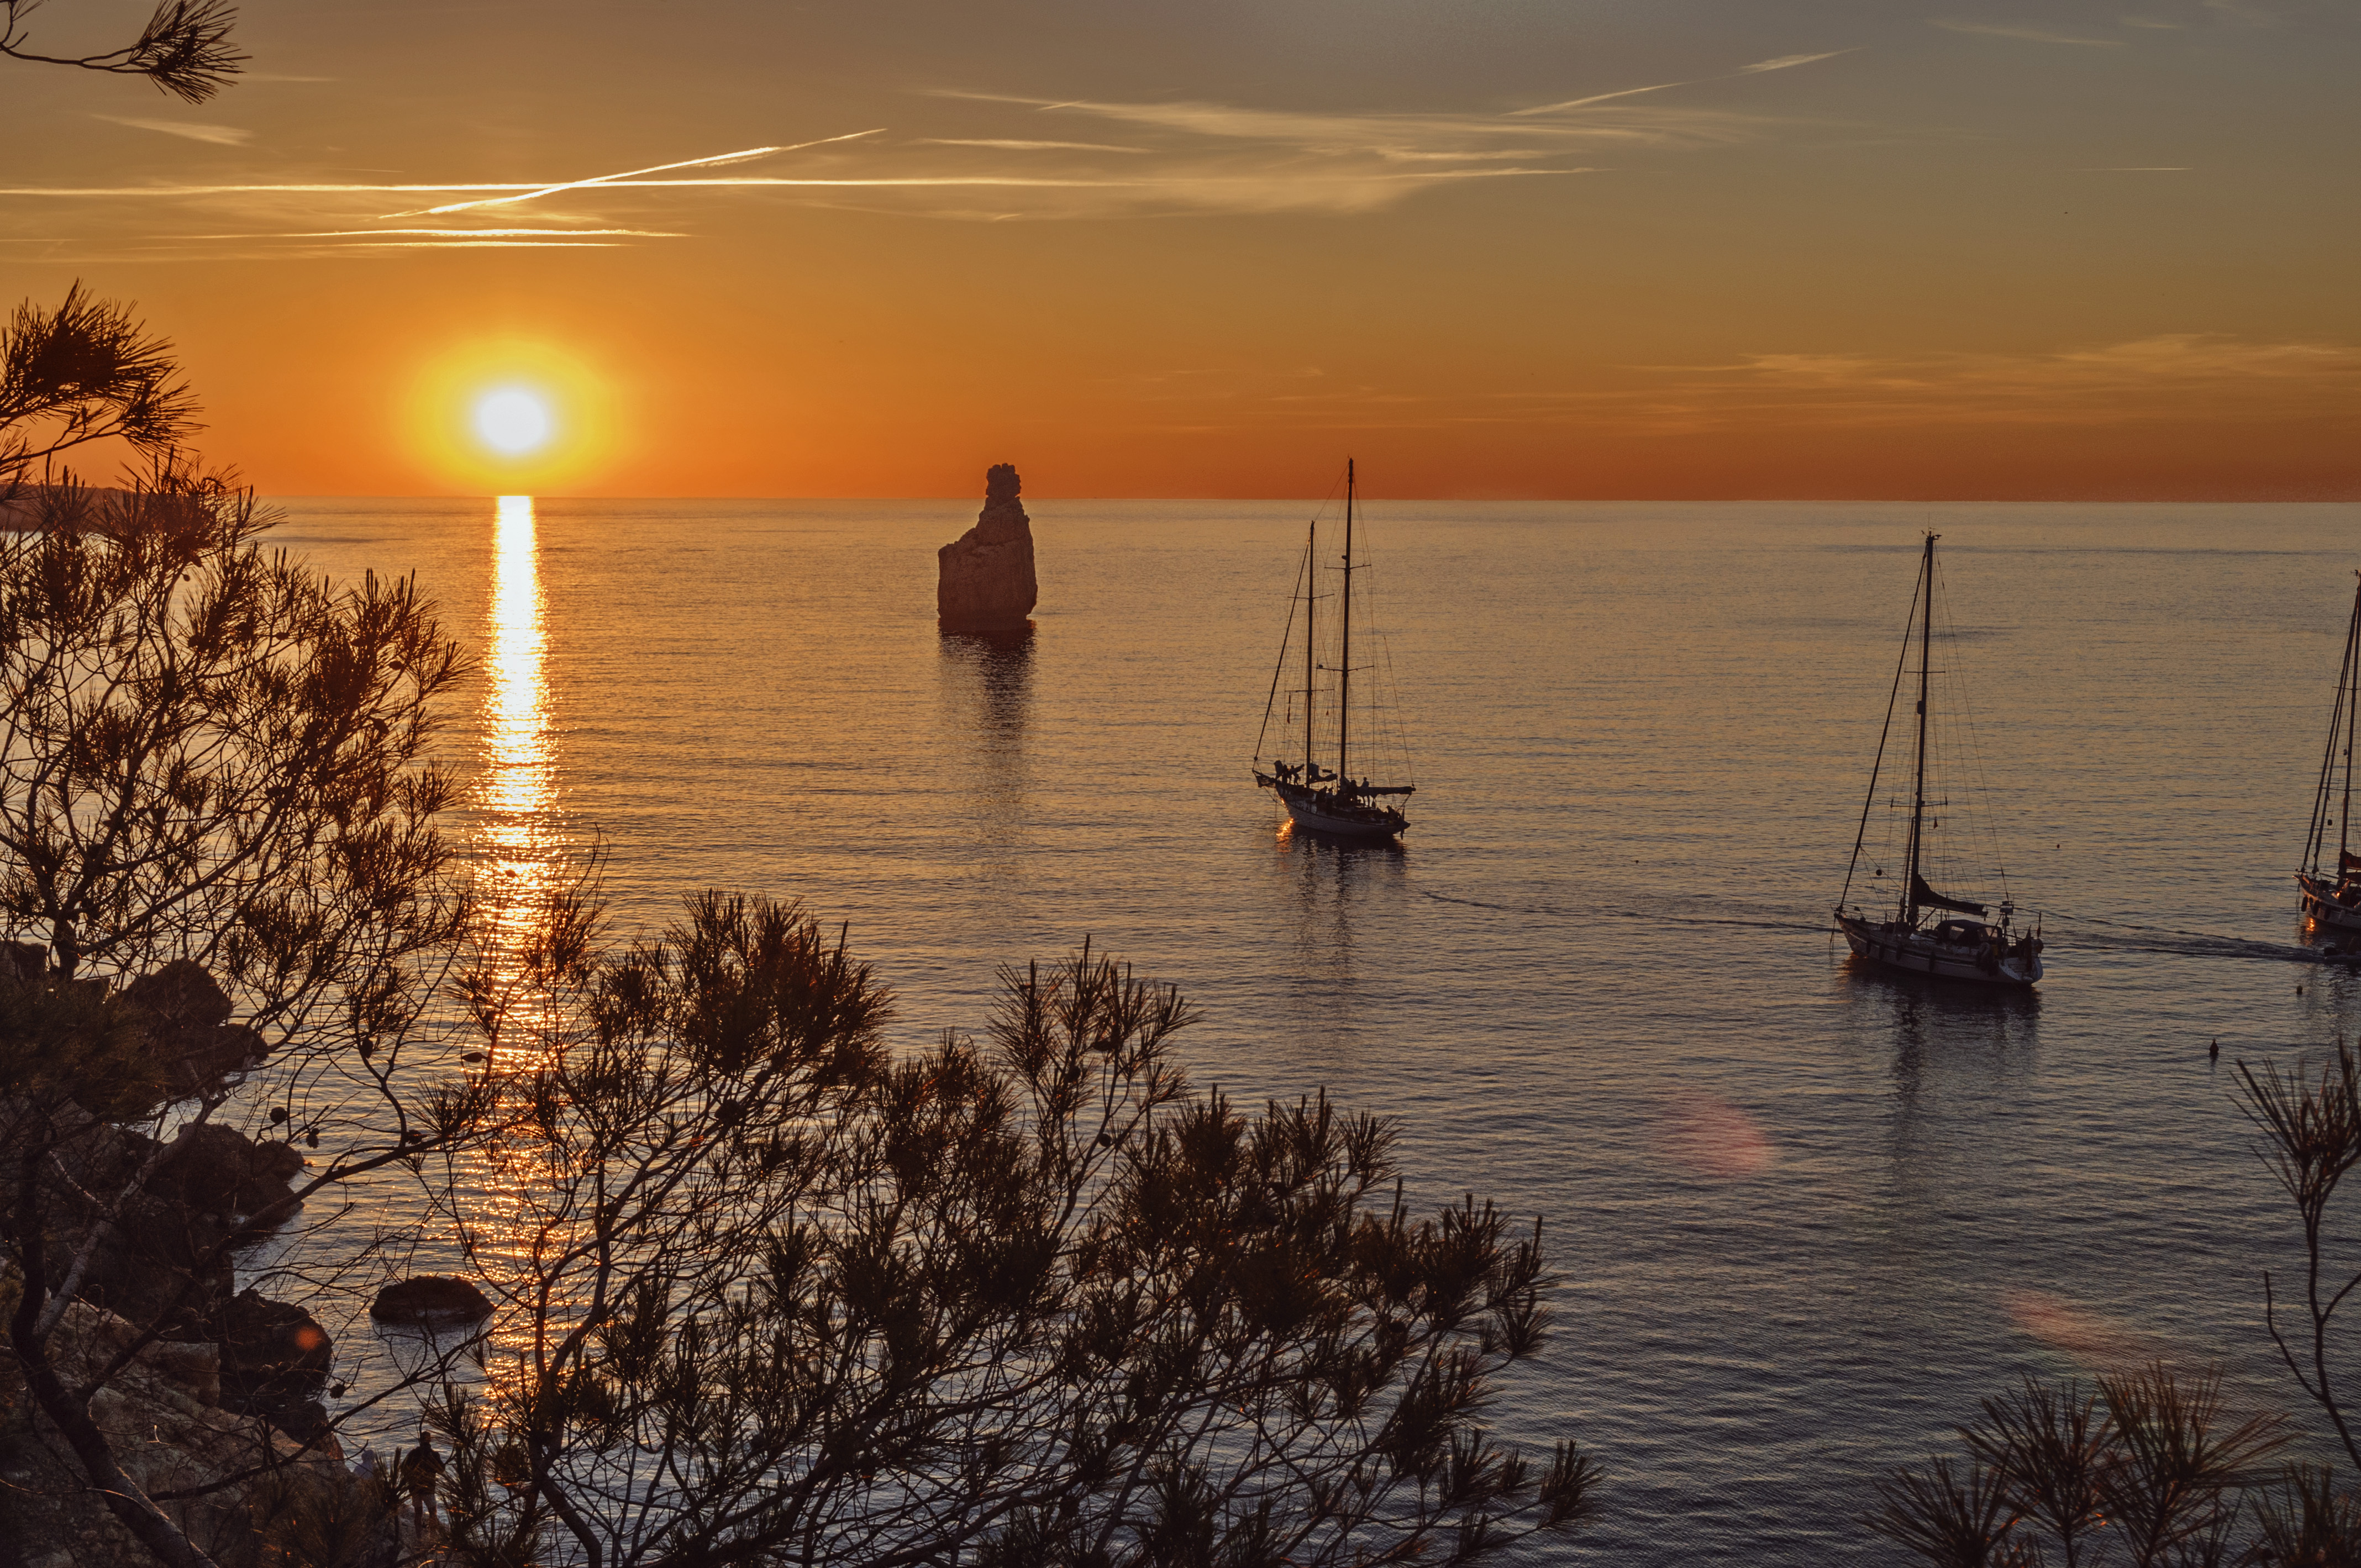 sunset near the beach cala Benirras, Ibiza,Spain